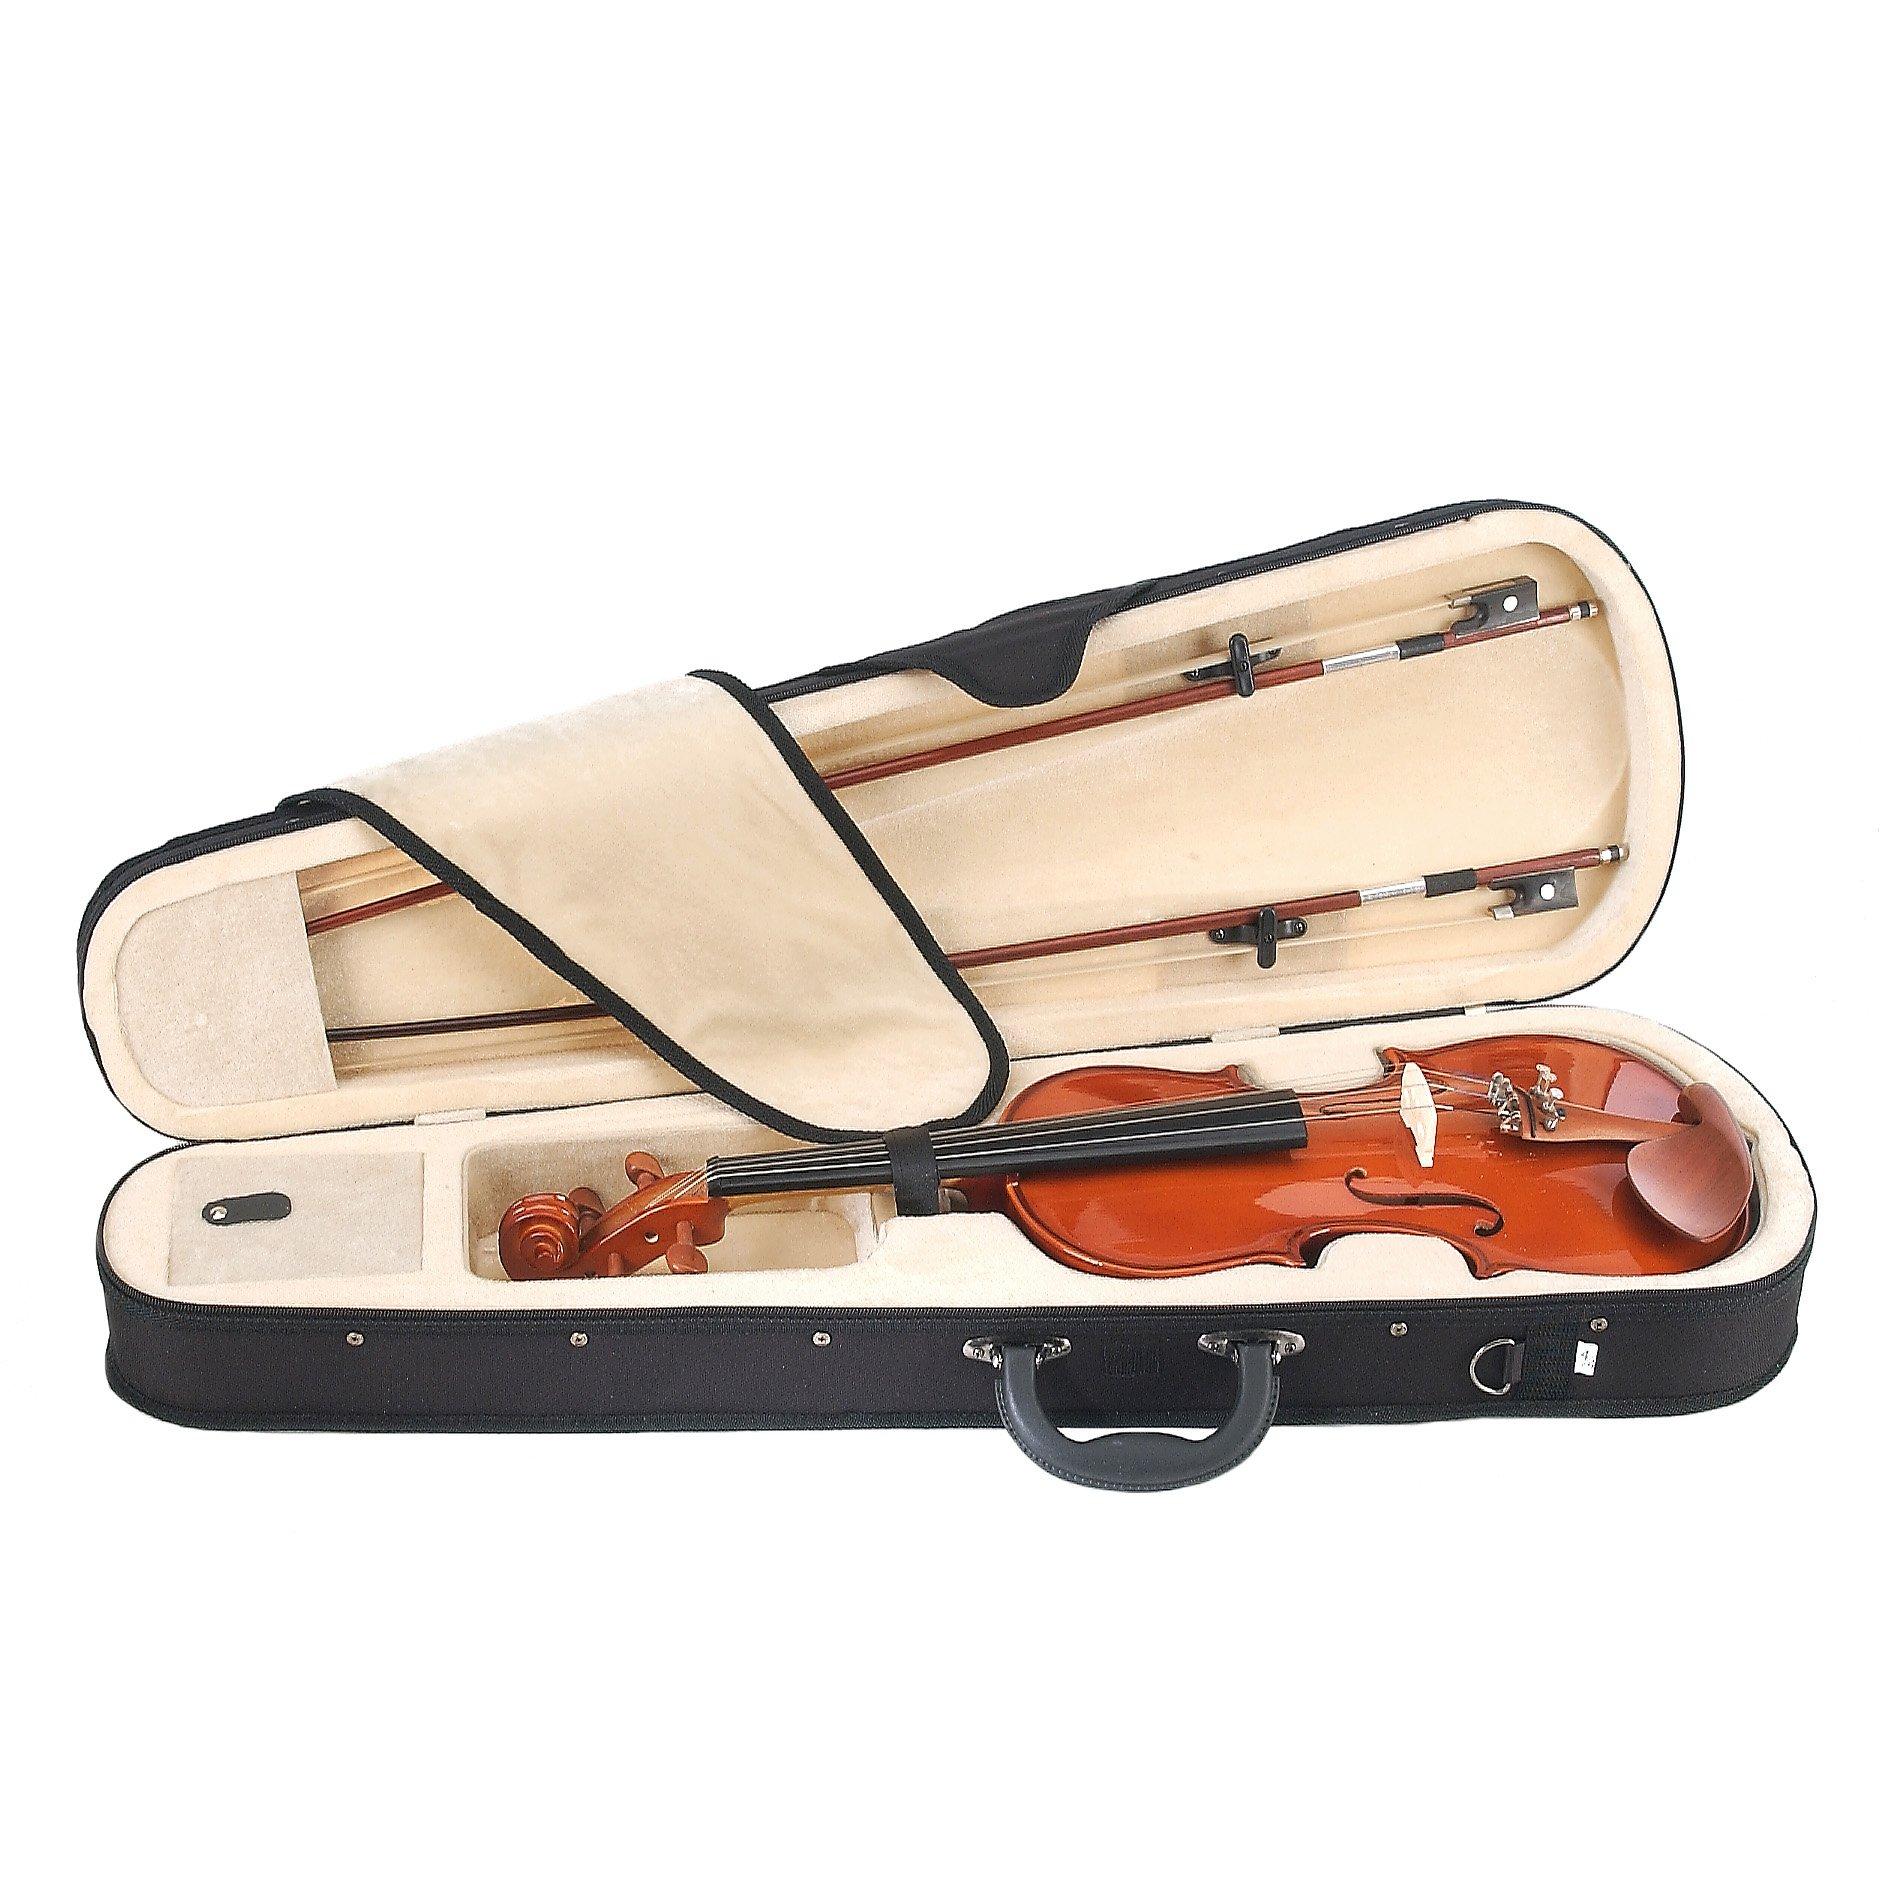 Cecilio CVN-200 Solidwood Violin with D'Addario Prelude Strings, Size 4/4 (Full Size) by Cecilio (Image #3)